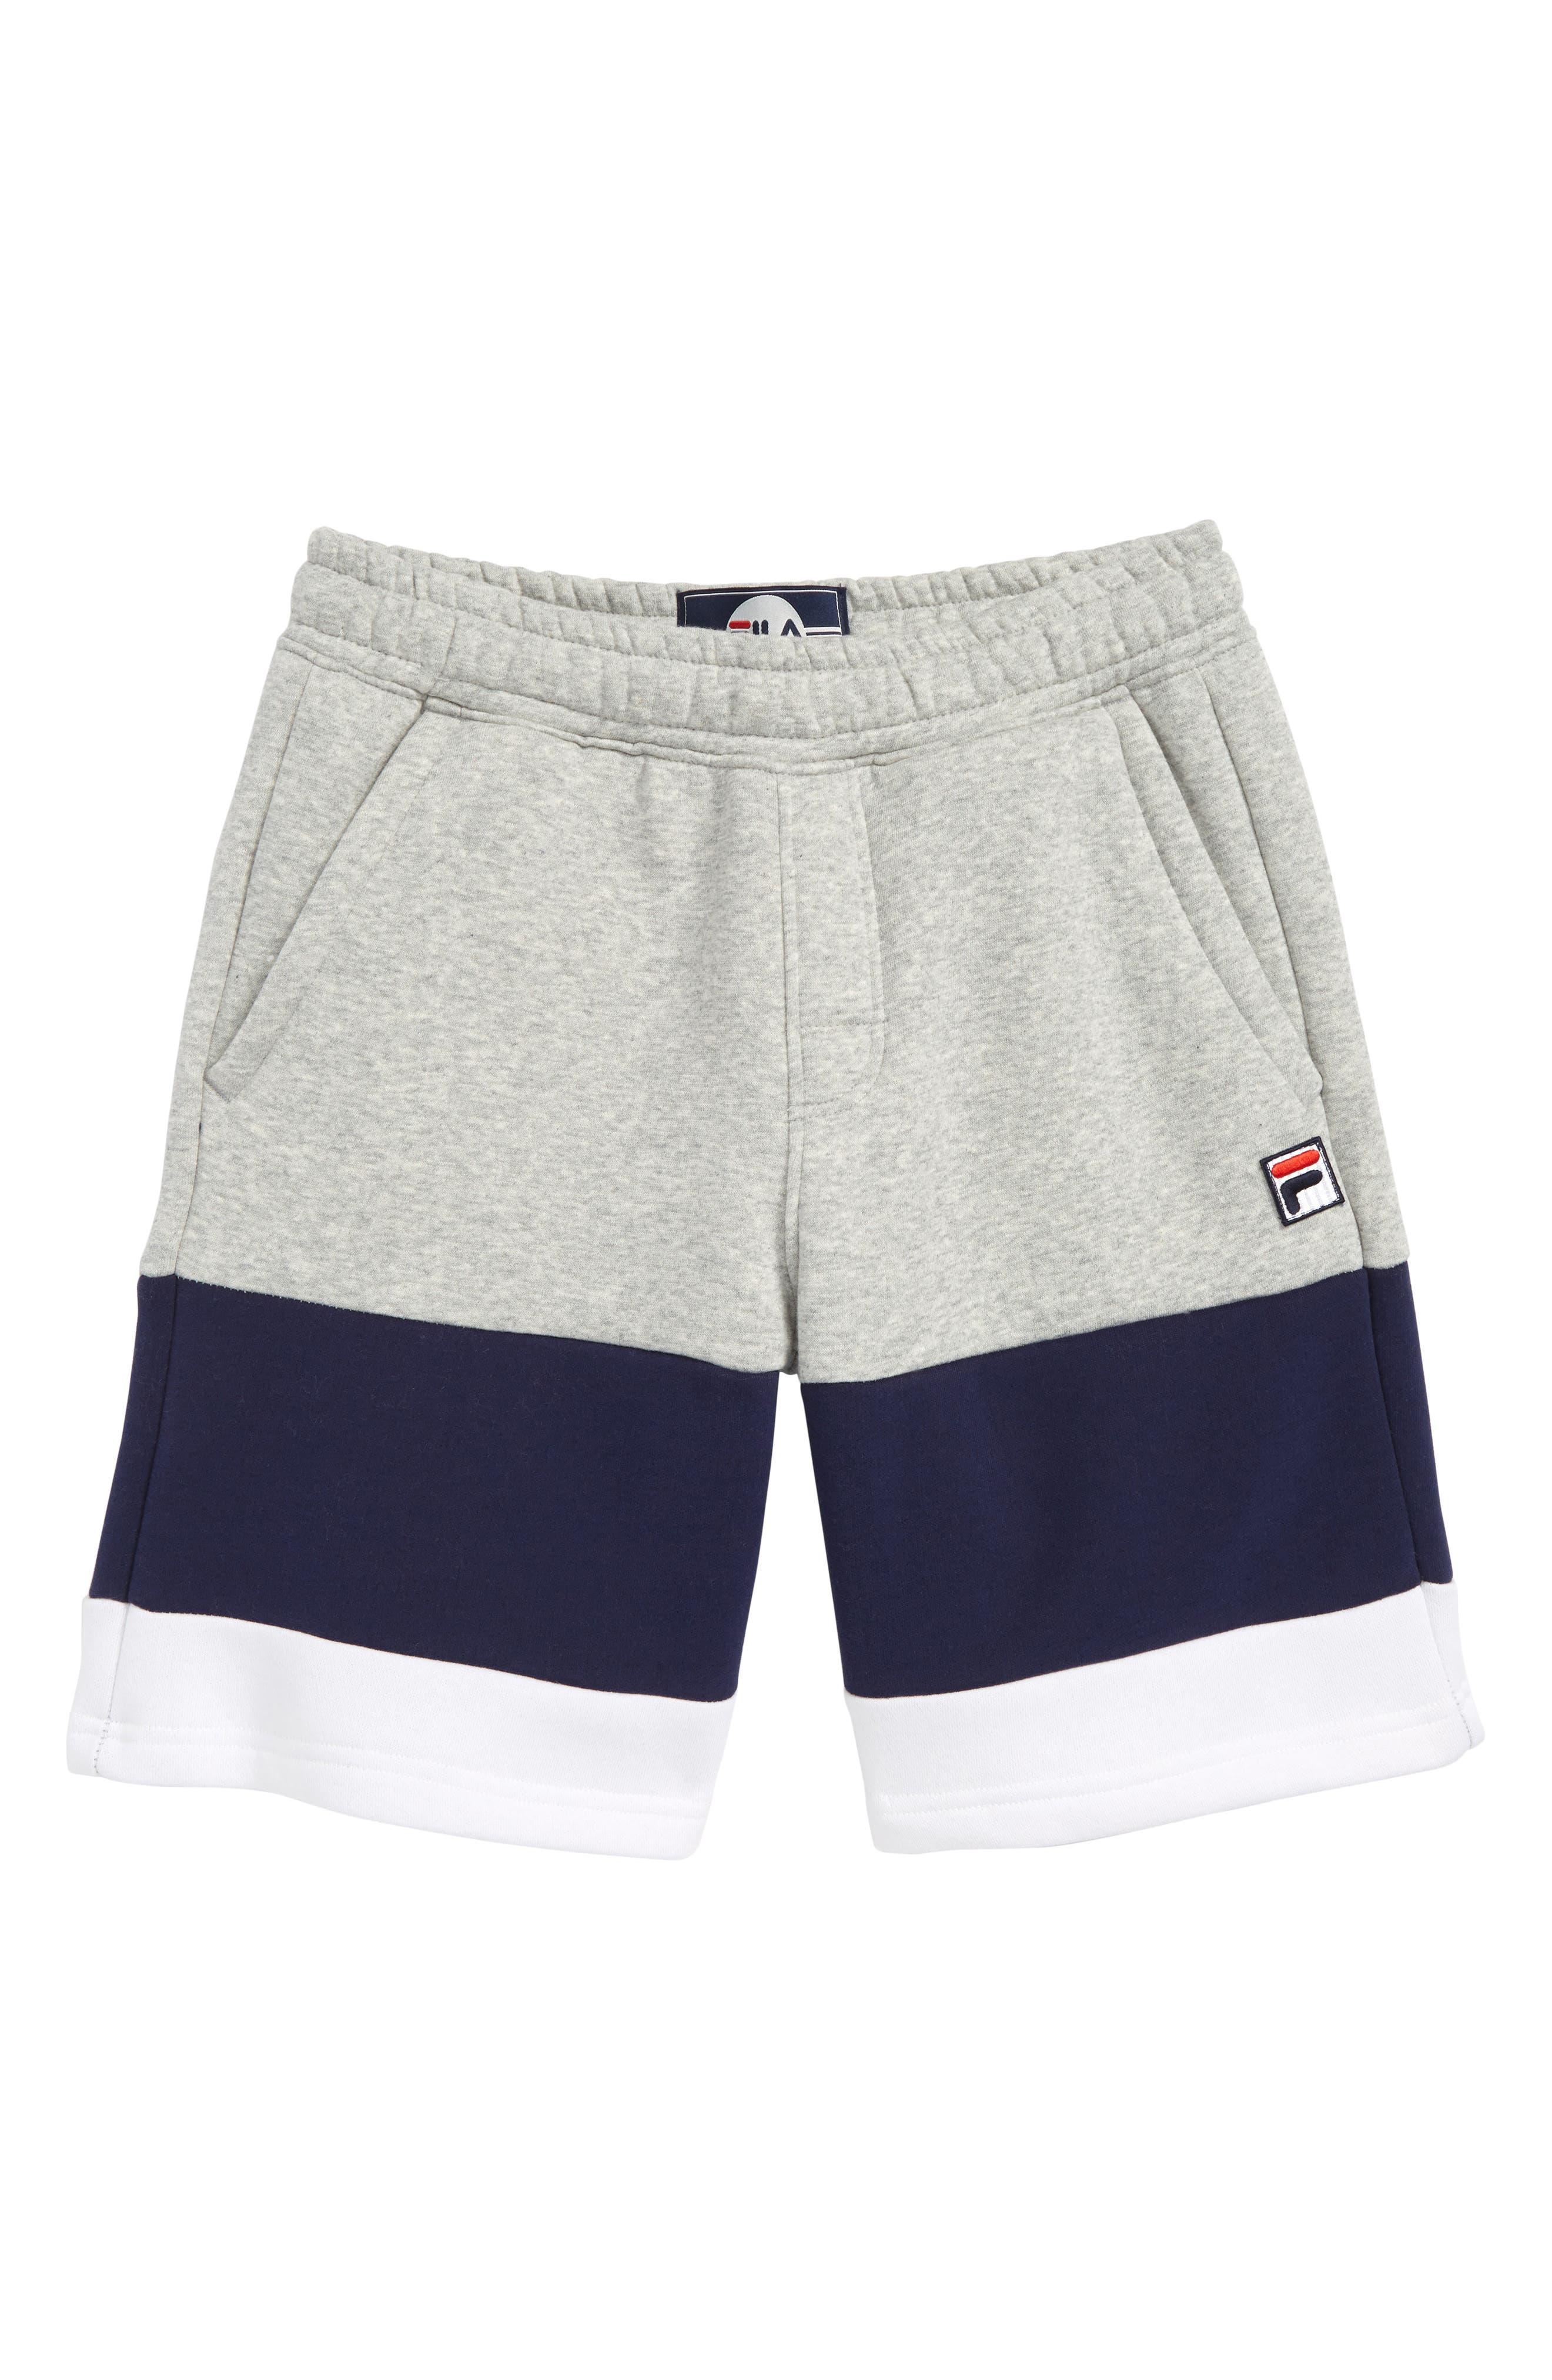 Colorblock Sweat Shorts,                         Main,                         color, 050